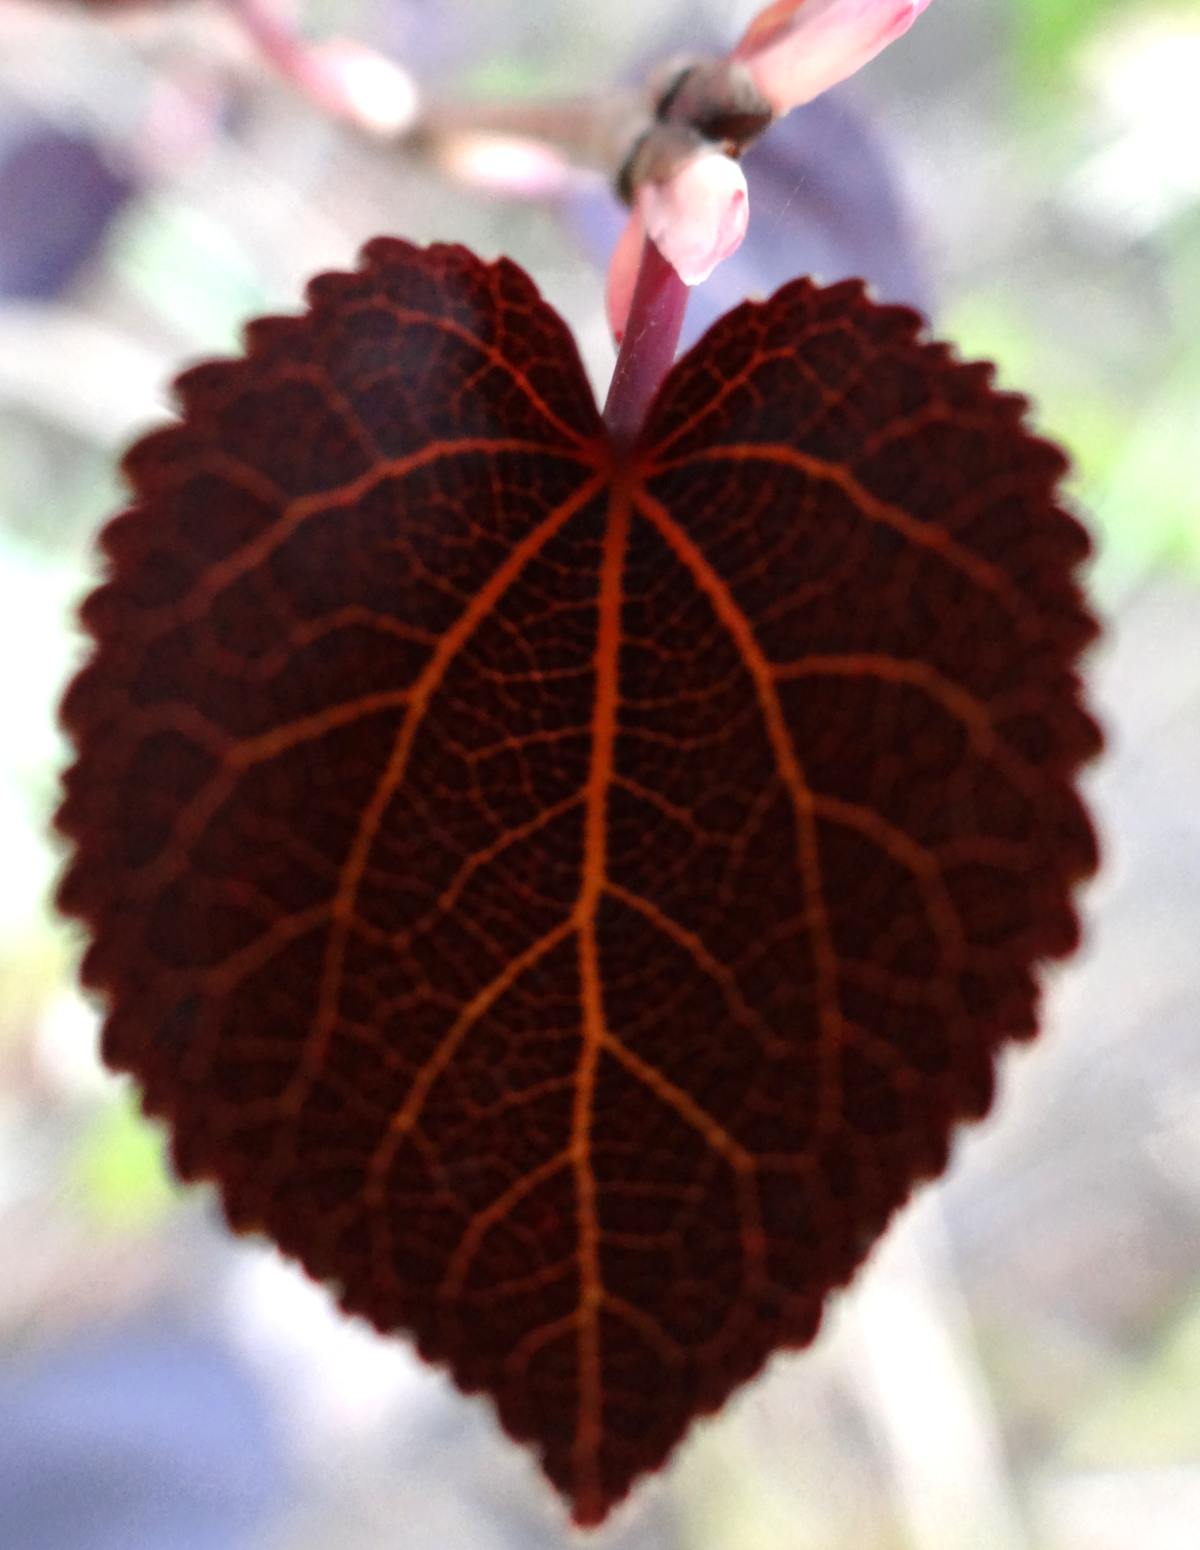 Red Fox or Rot Fuchs katsura tree variety leaf